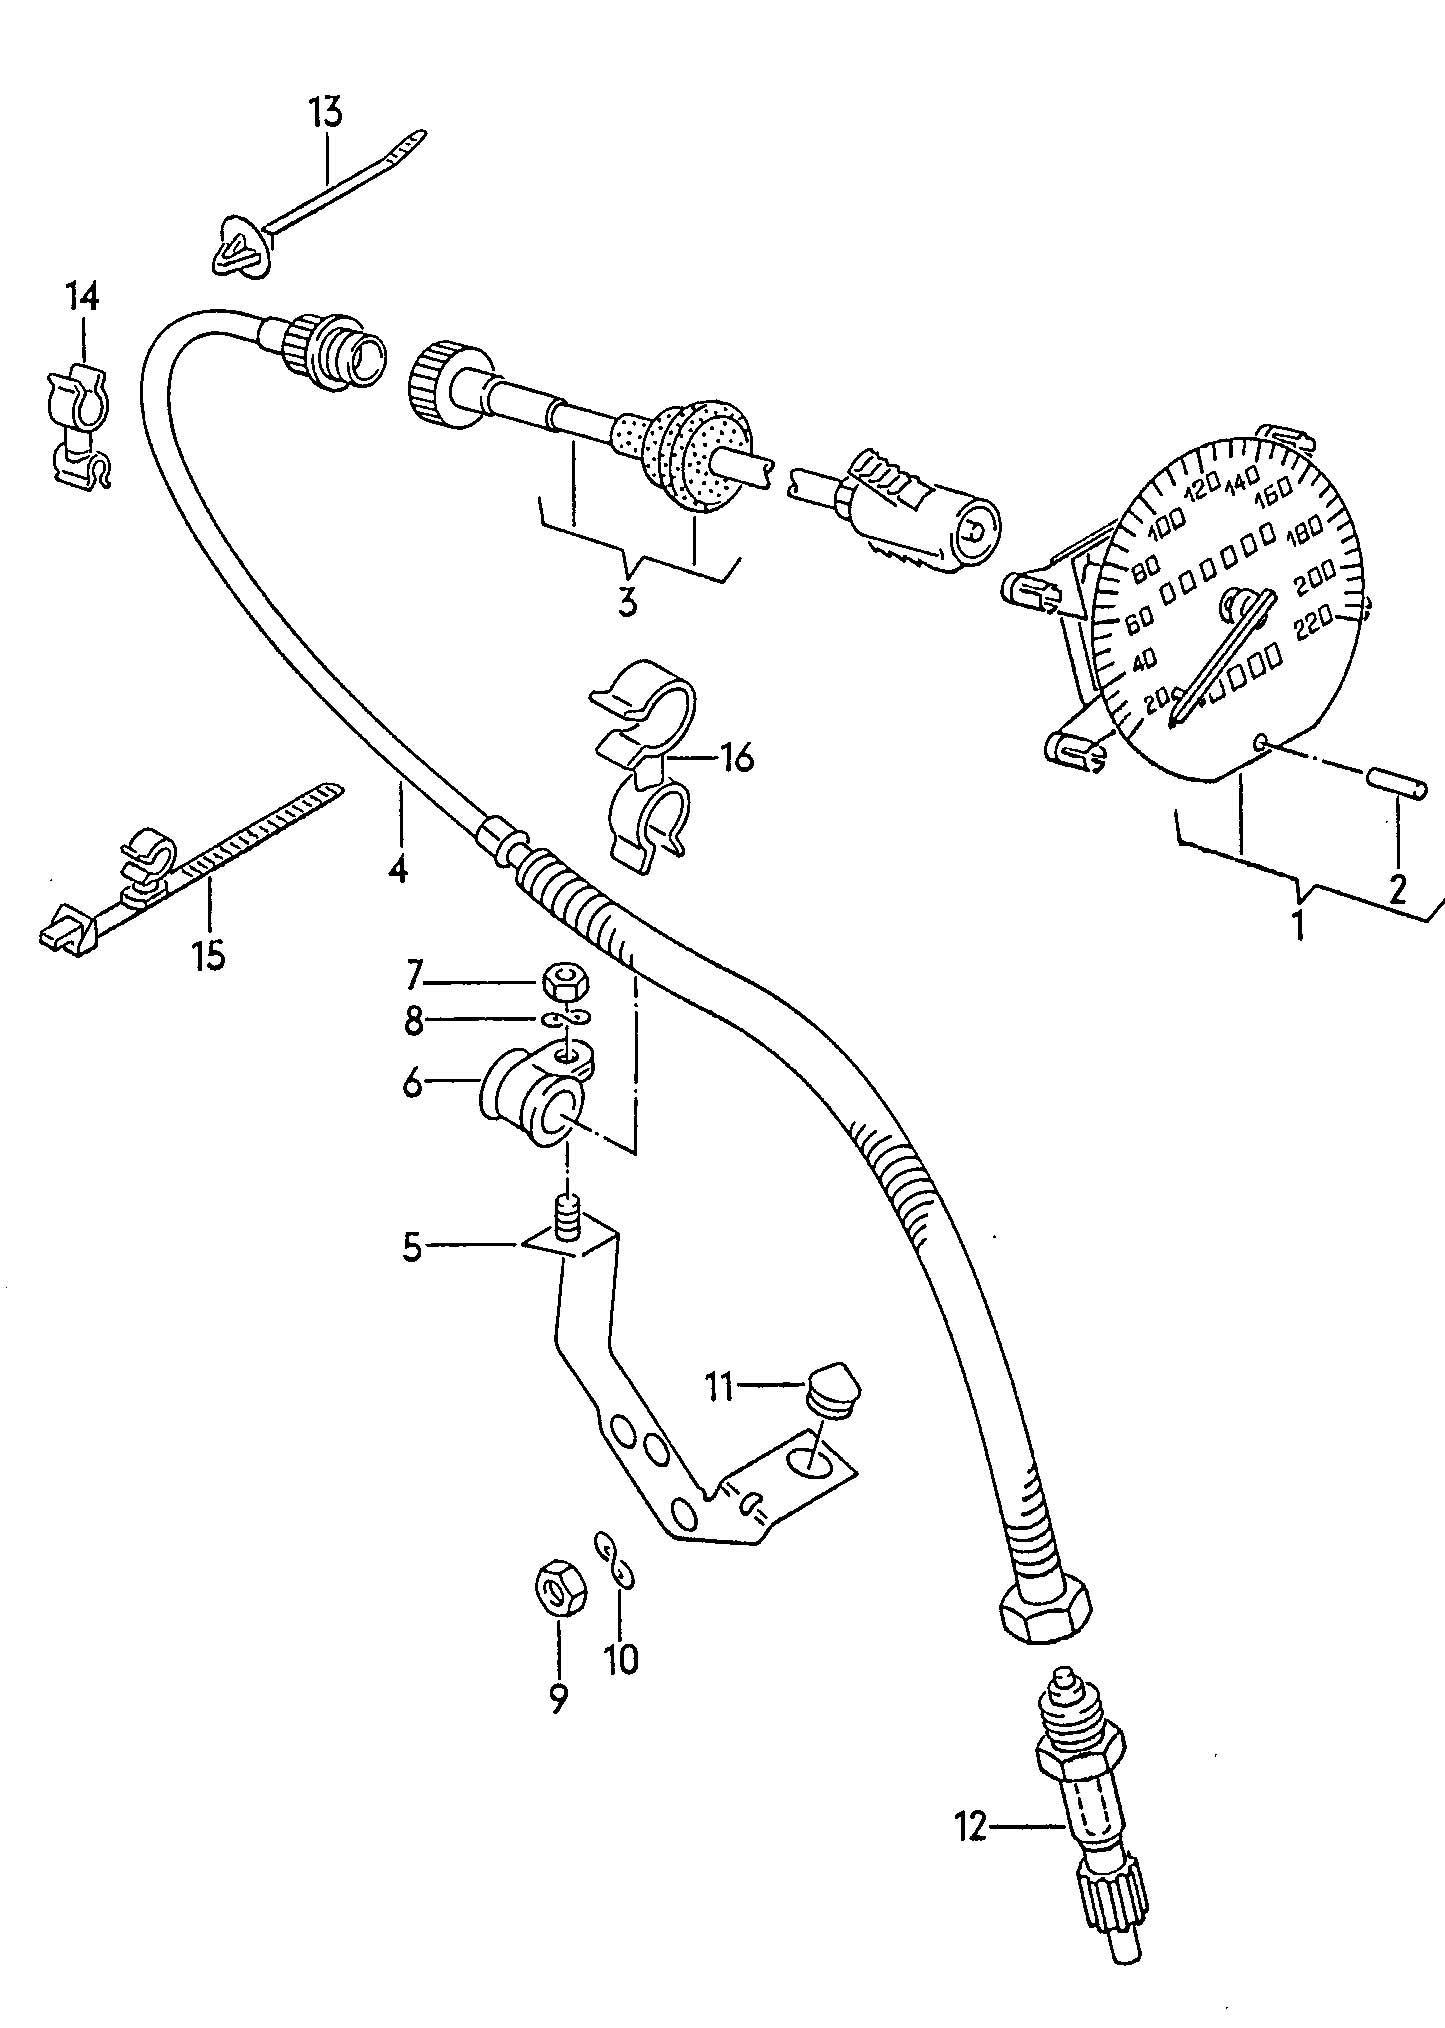 Esqvw1 moreover 2001 Eurovan Alternator Wiring Diagram also 701853669 moreover 1993 likewise Vw Jetta Transmission Valve Body Diagram. on 1993 volkswagen eurovan